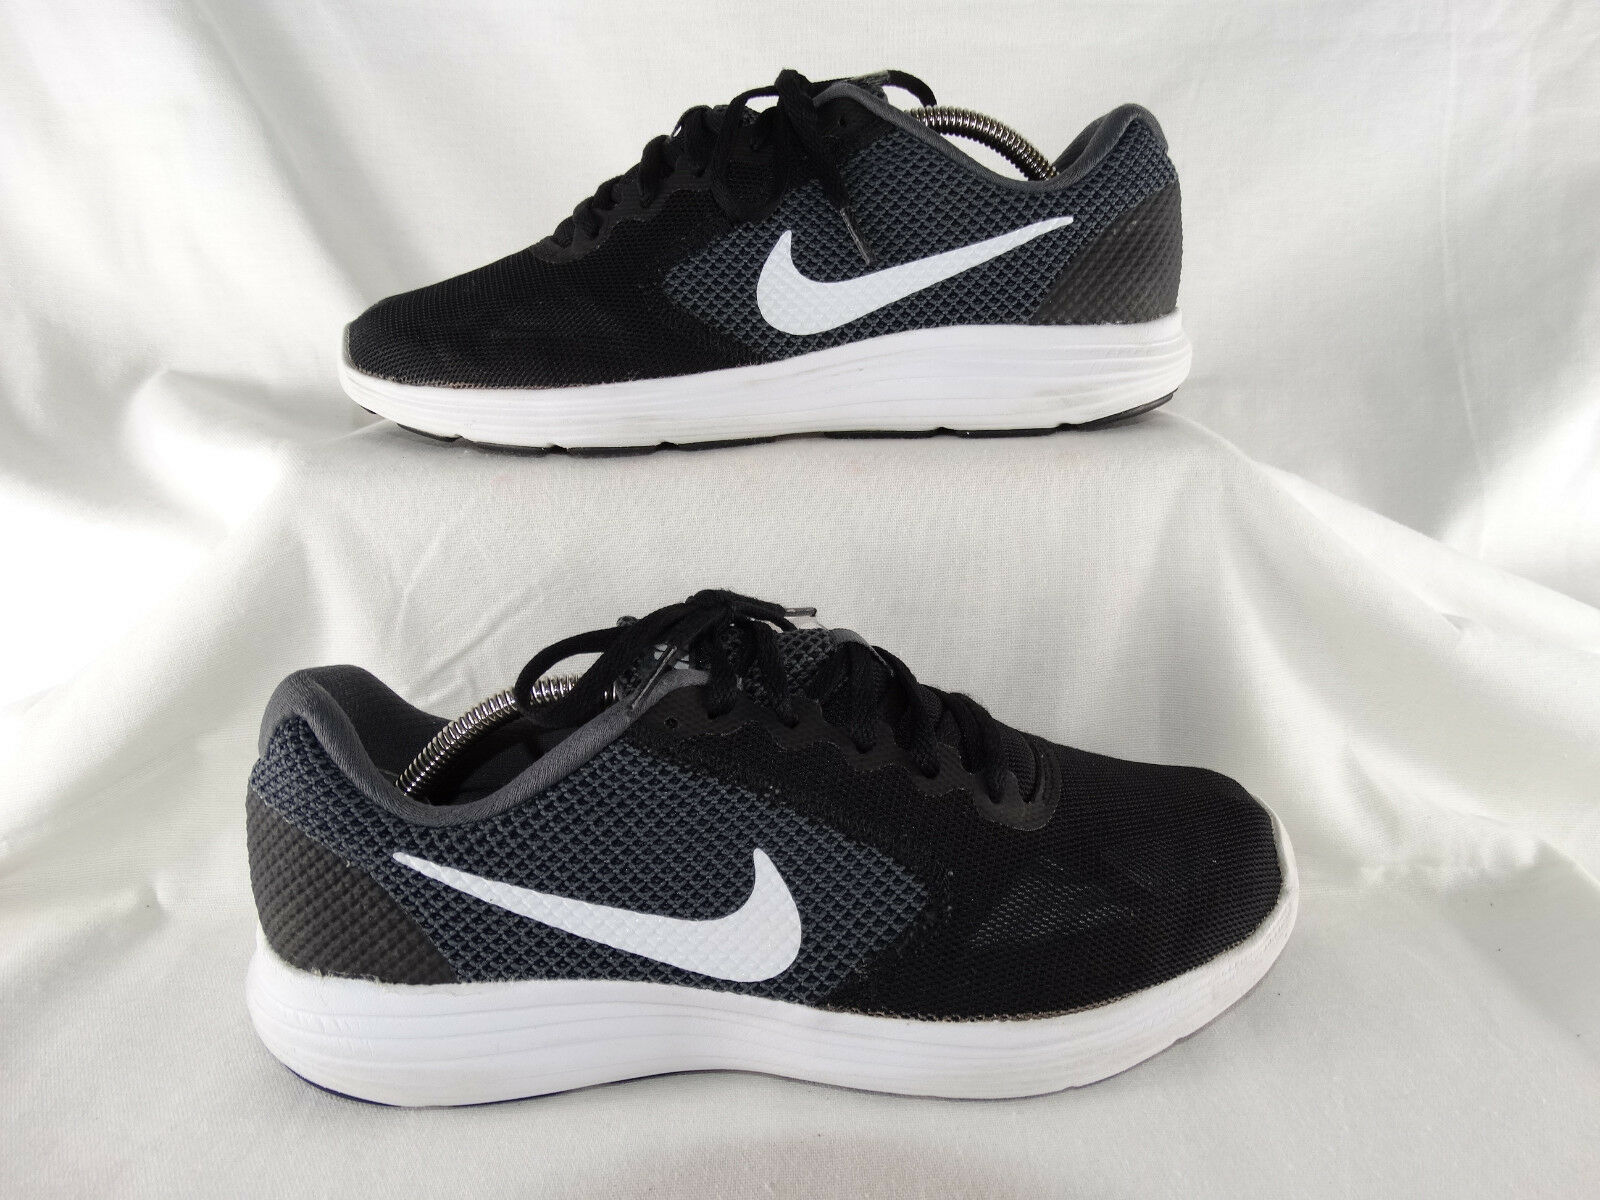 Nike Nike Nike Revolution 3 Laufschuhe 819300 001 schwarz